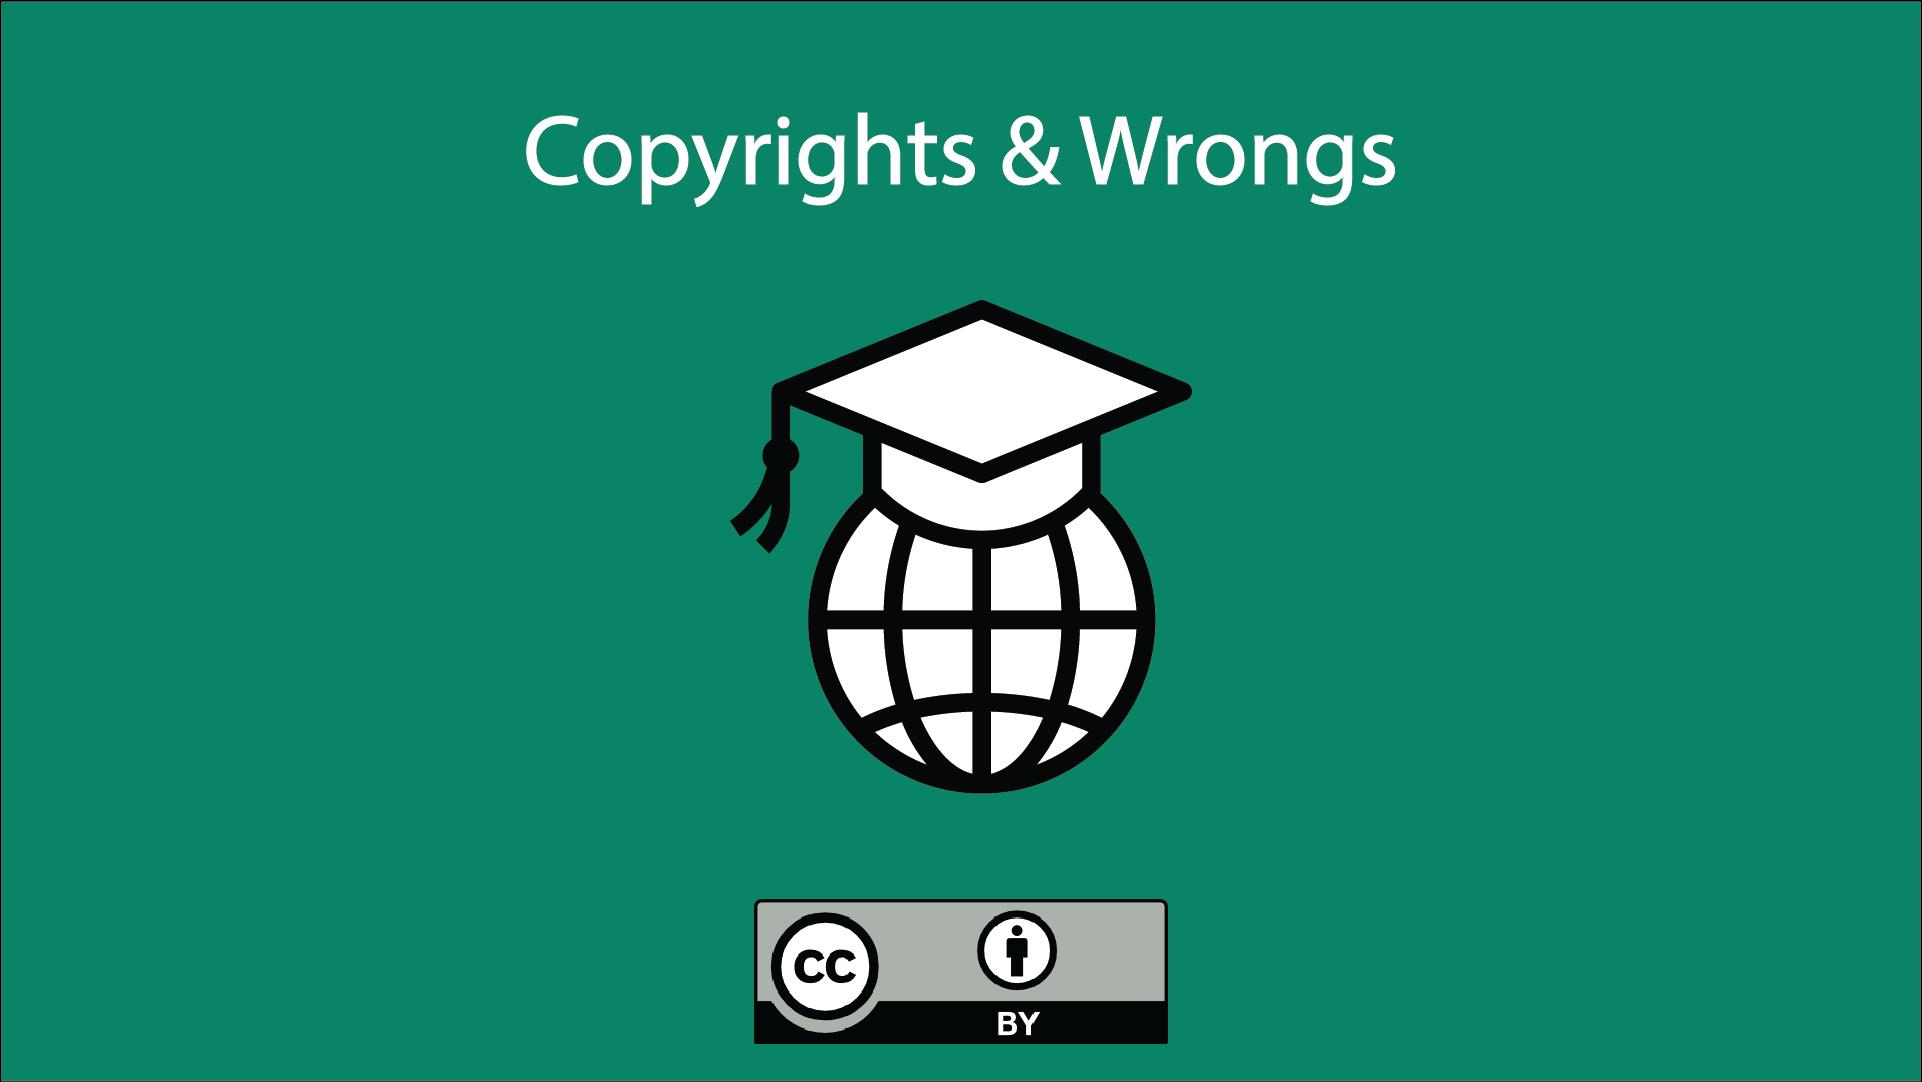 Copyrights & Wrongs